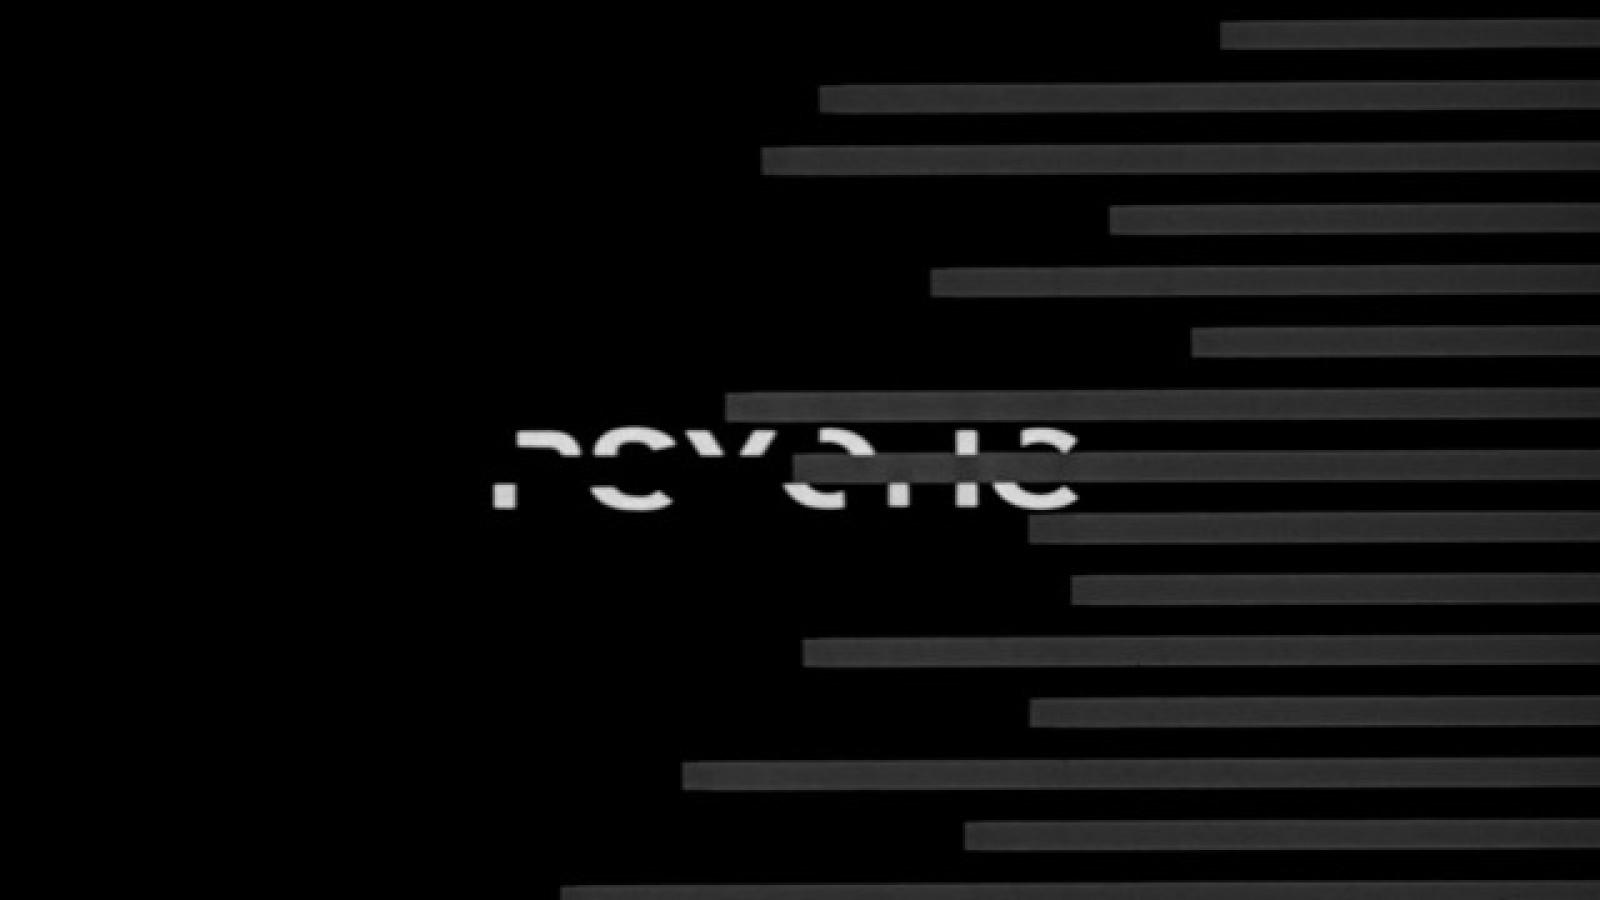 Bass_Psycho-1600x900-c-default.jpg